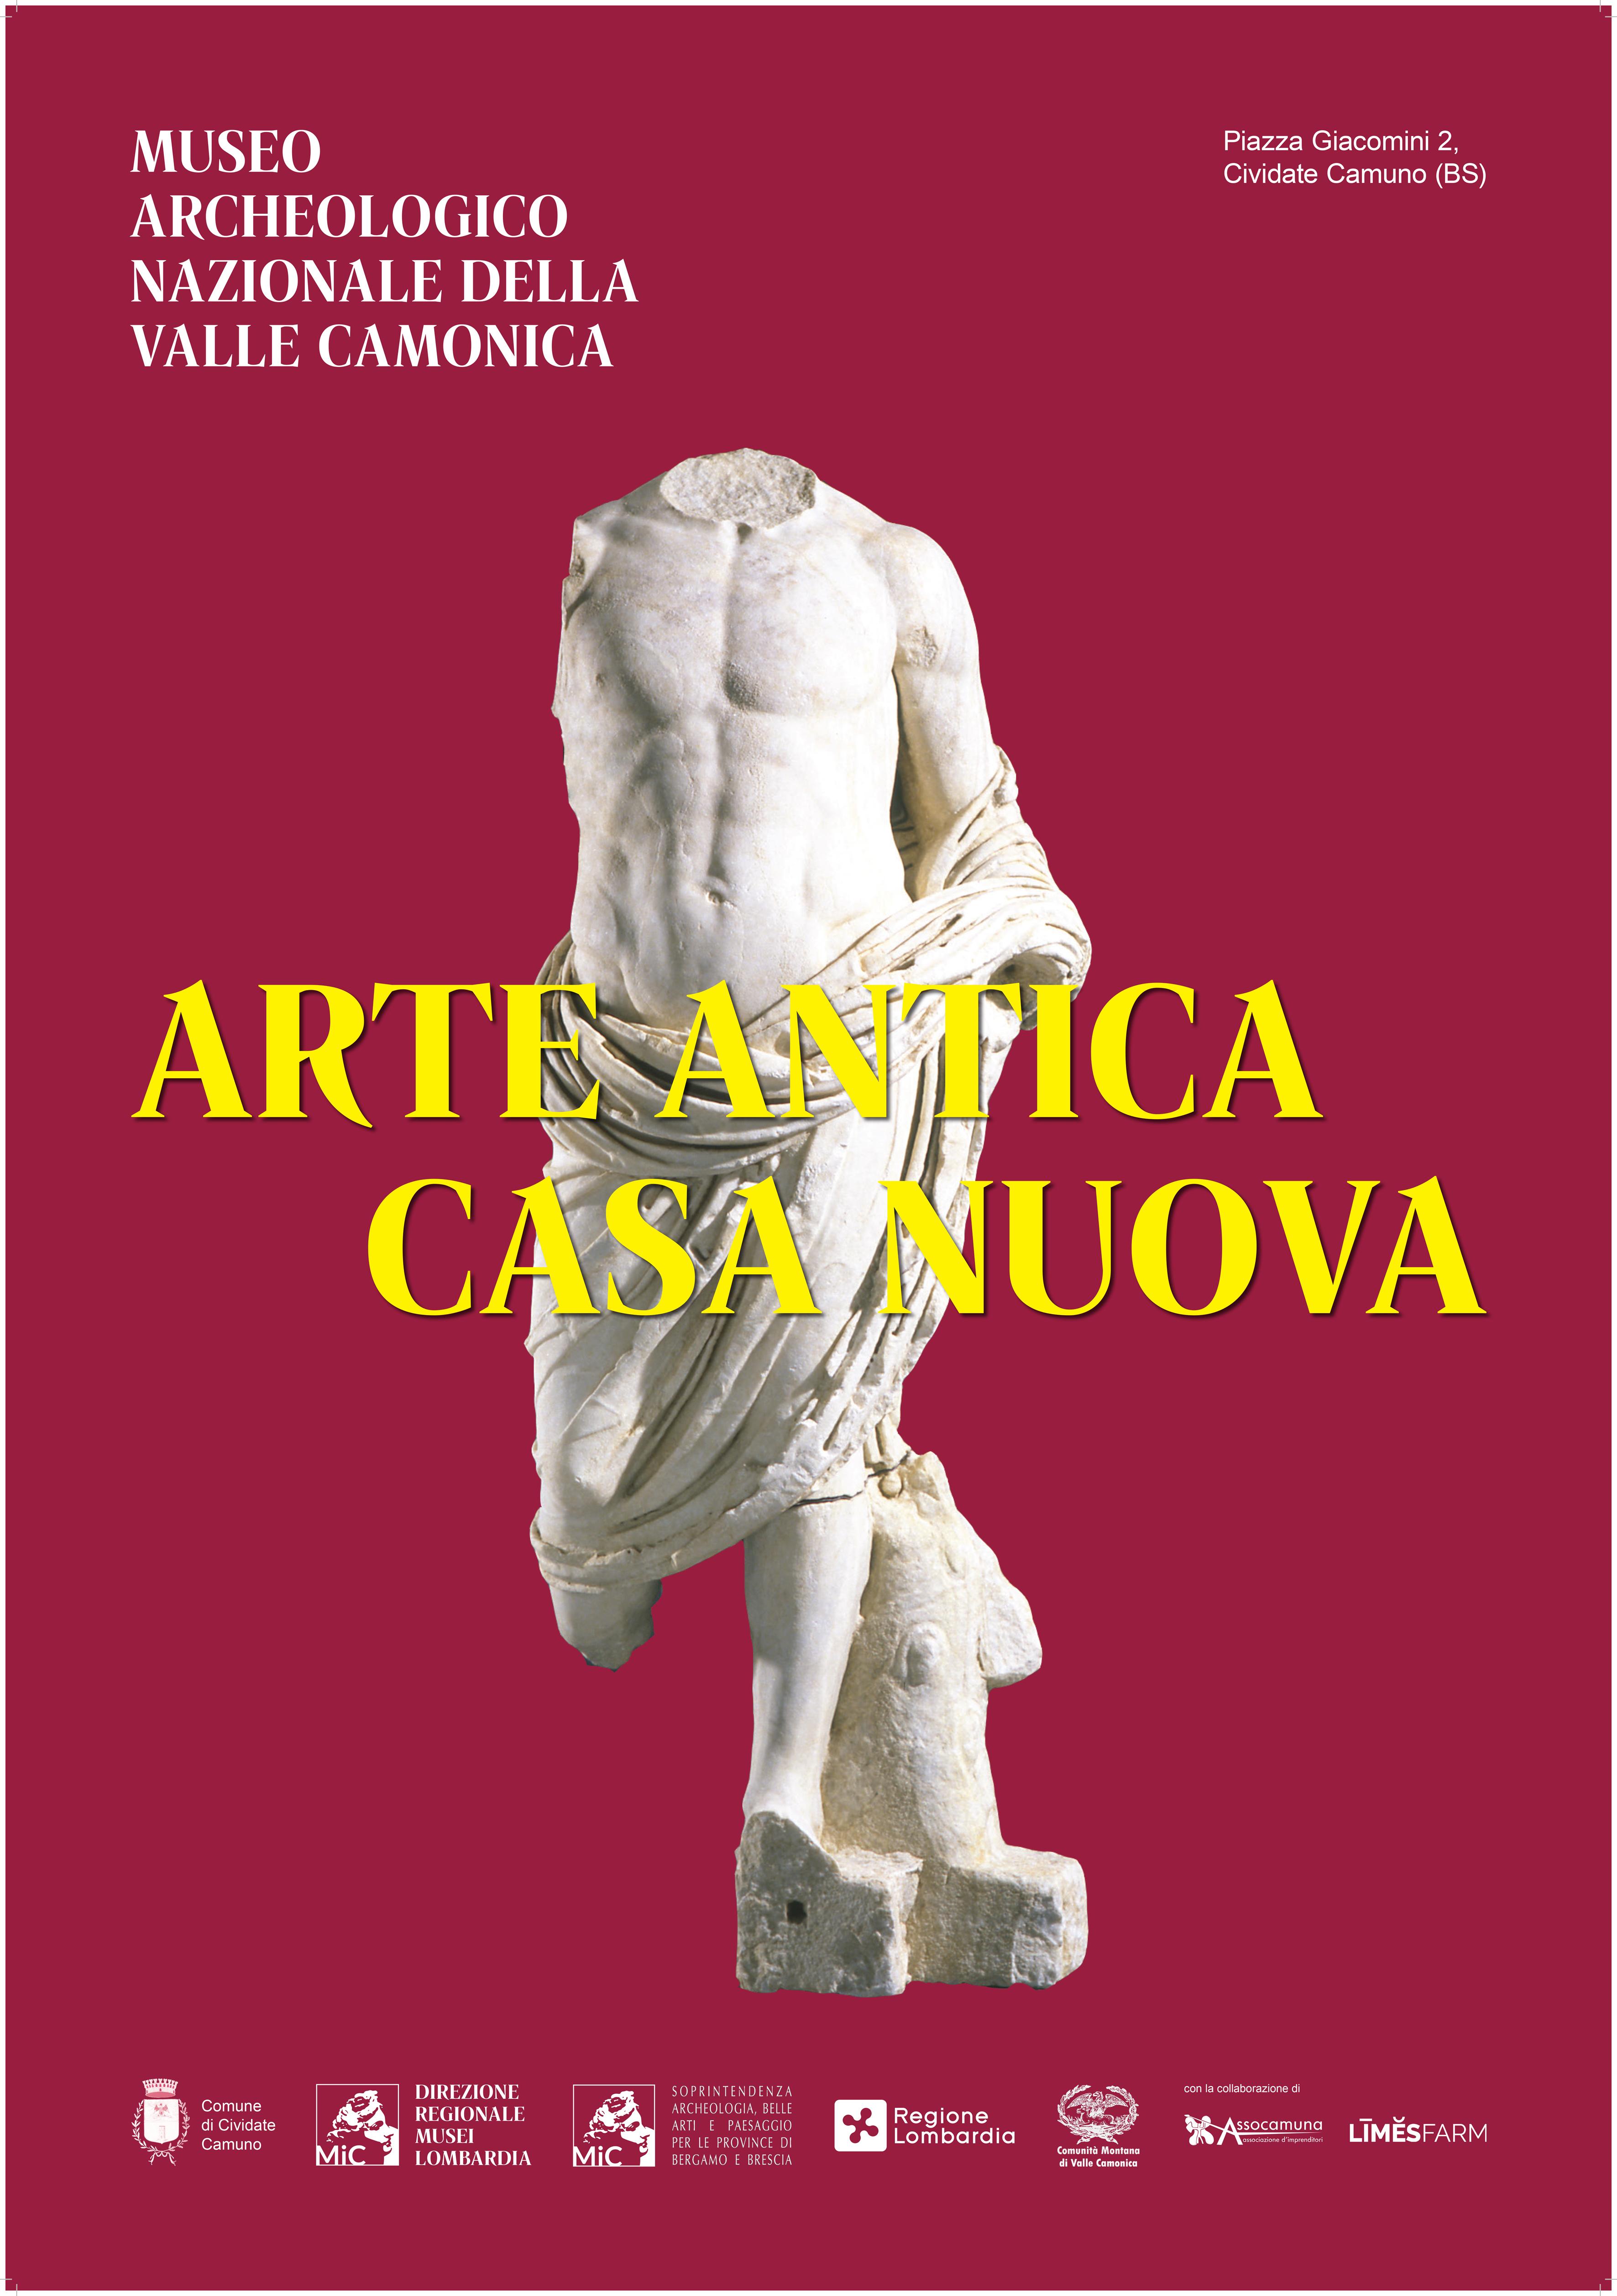 cividate-camuno_archeologico_poster_foto-drm-lombardia